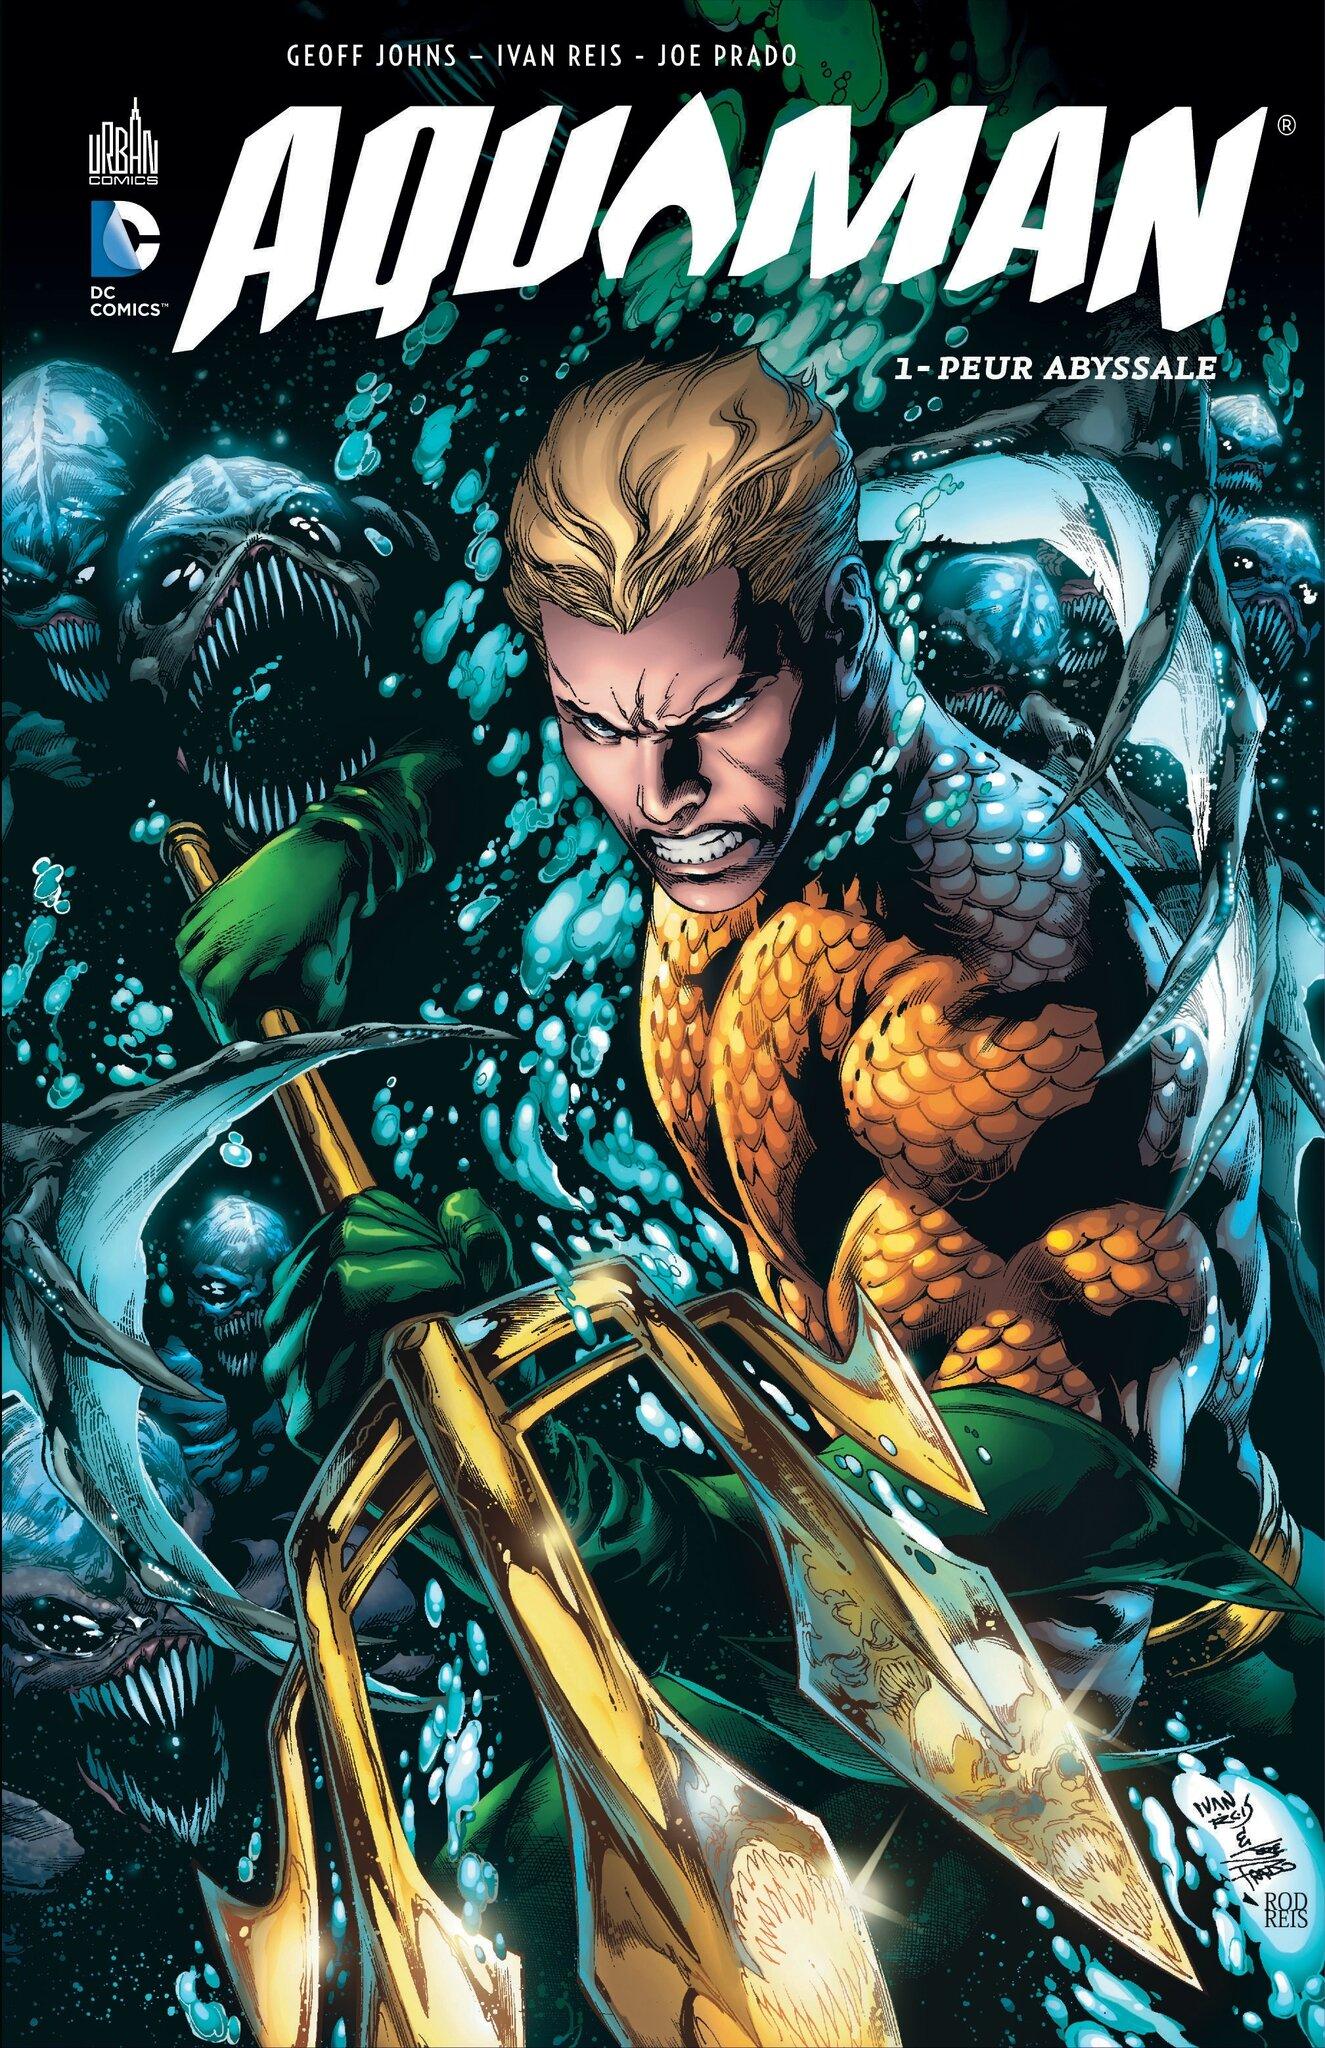 Urban DC Aquaman 1 Peur abyssale